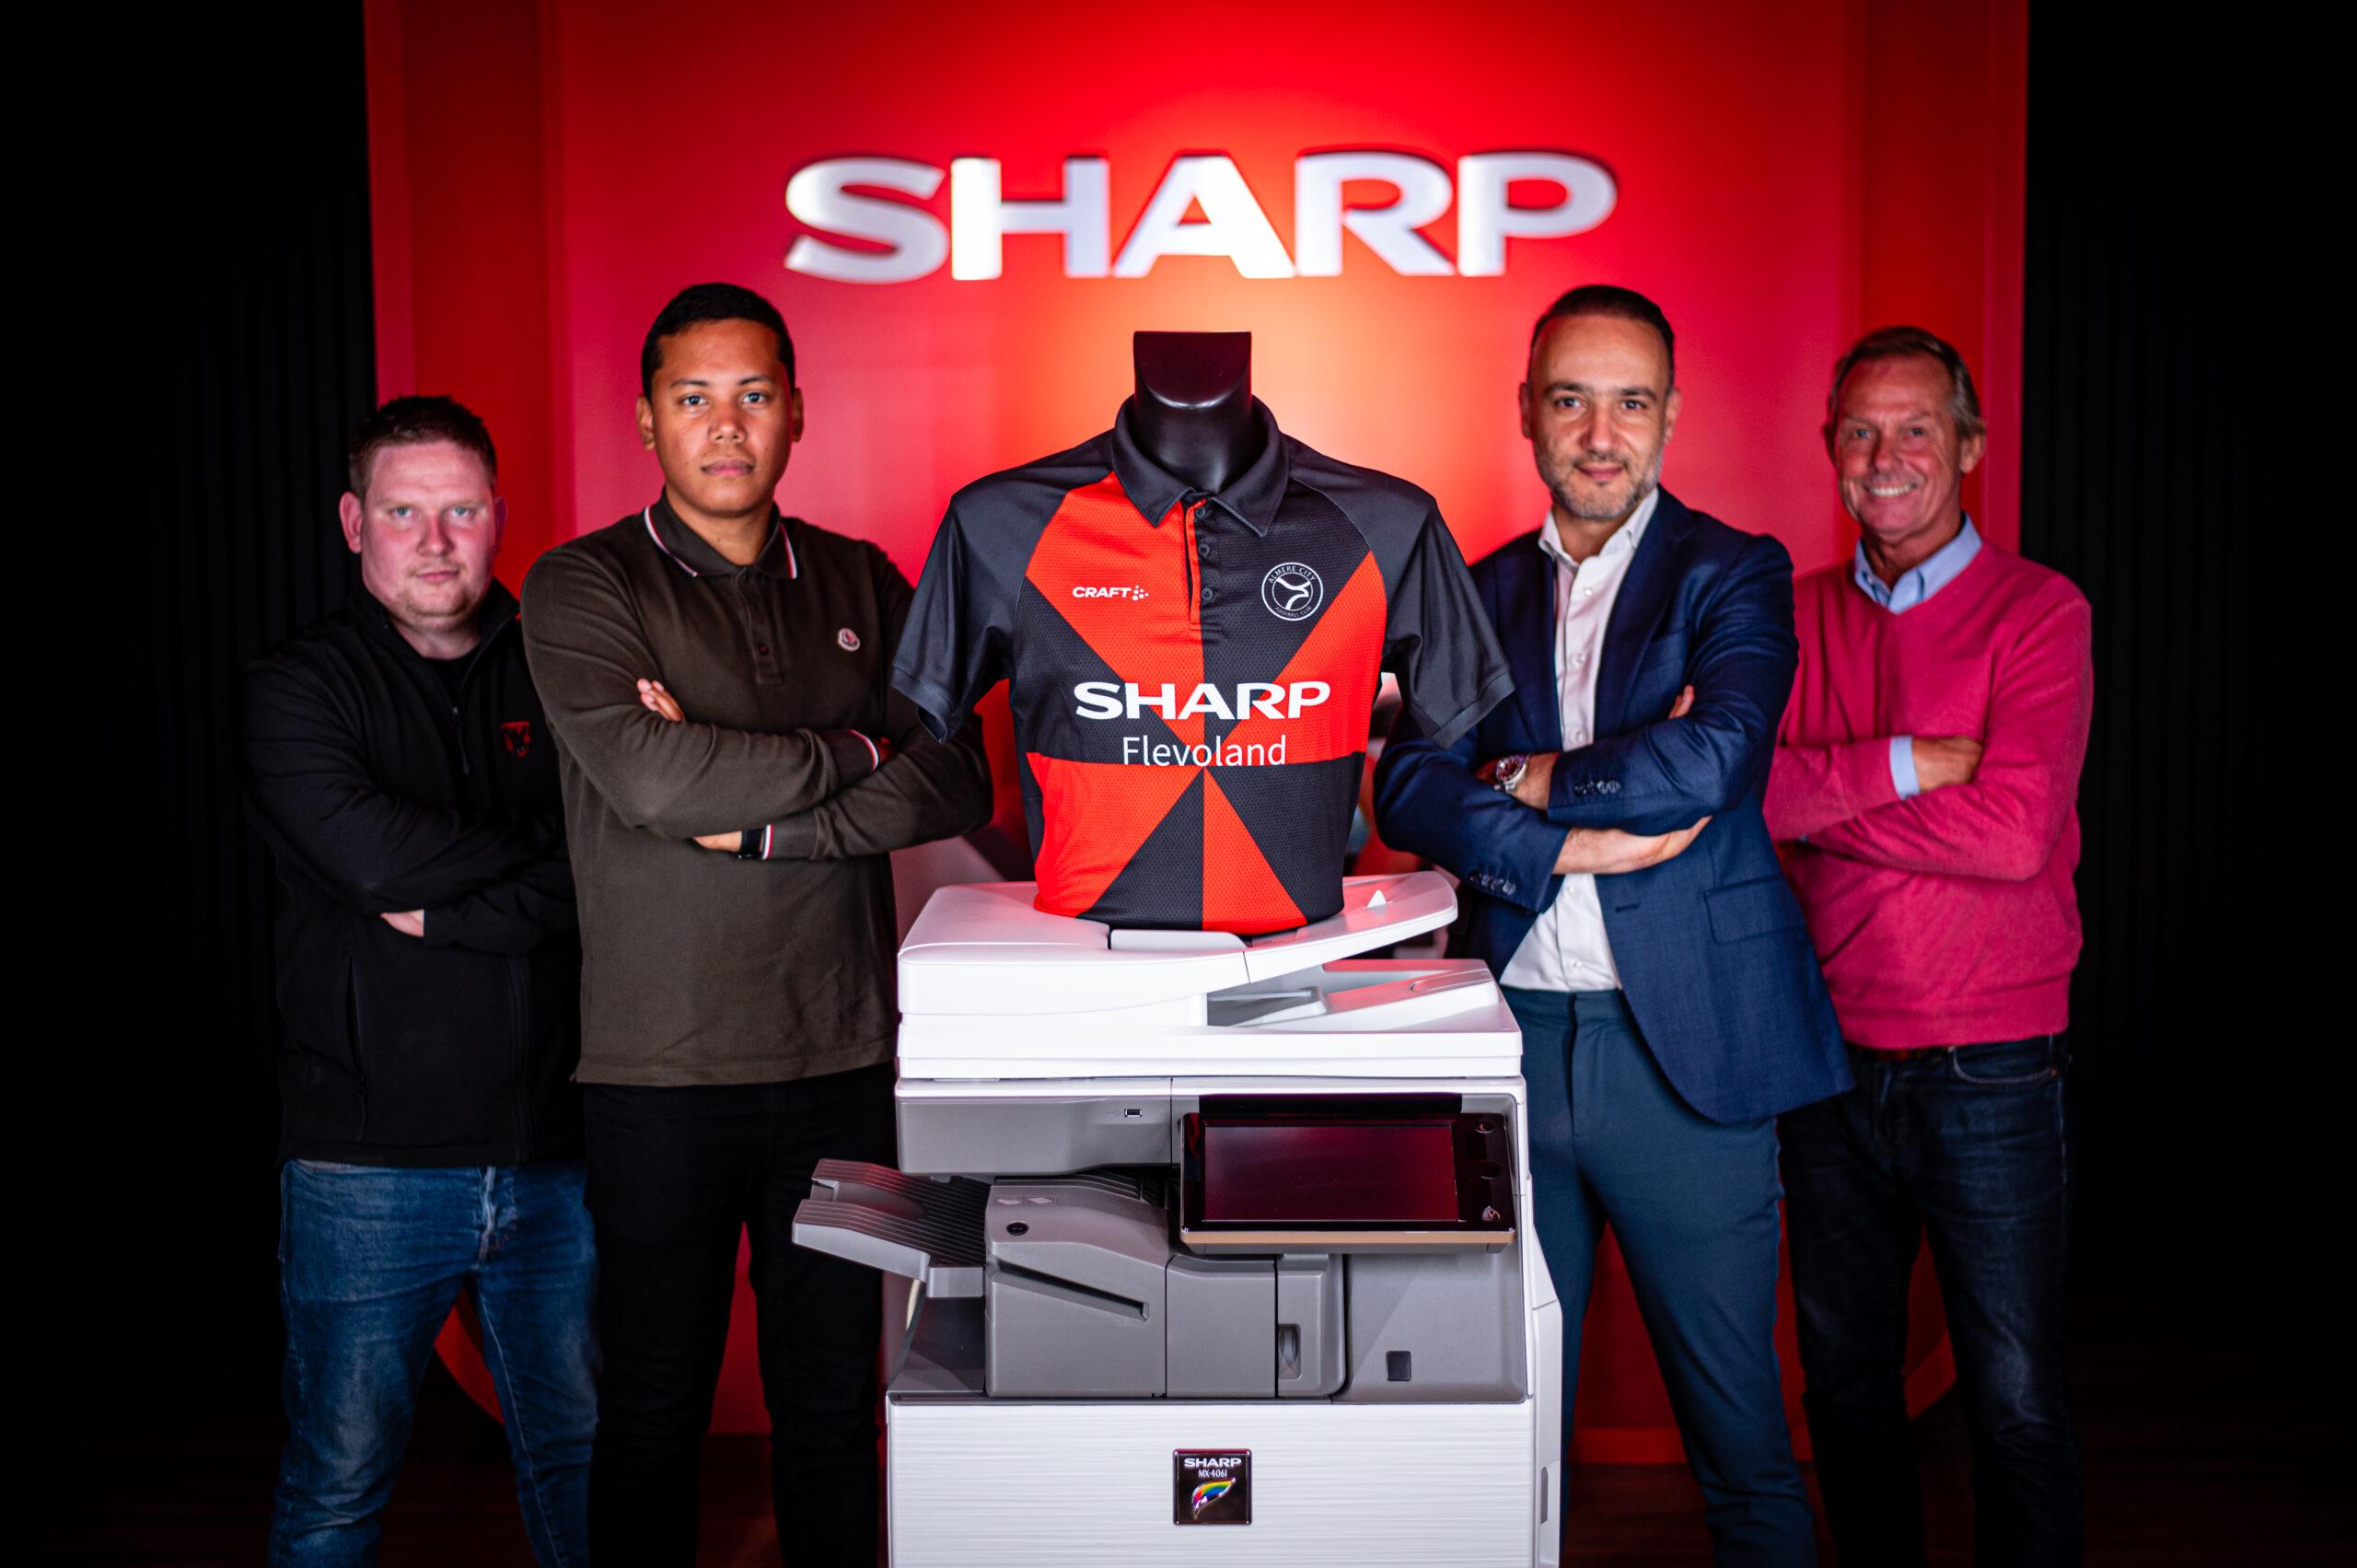 Supporters en SHARP Business Point Flevoland presenteren uniek bekershirt